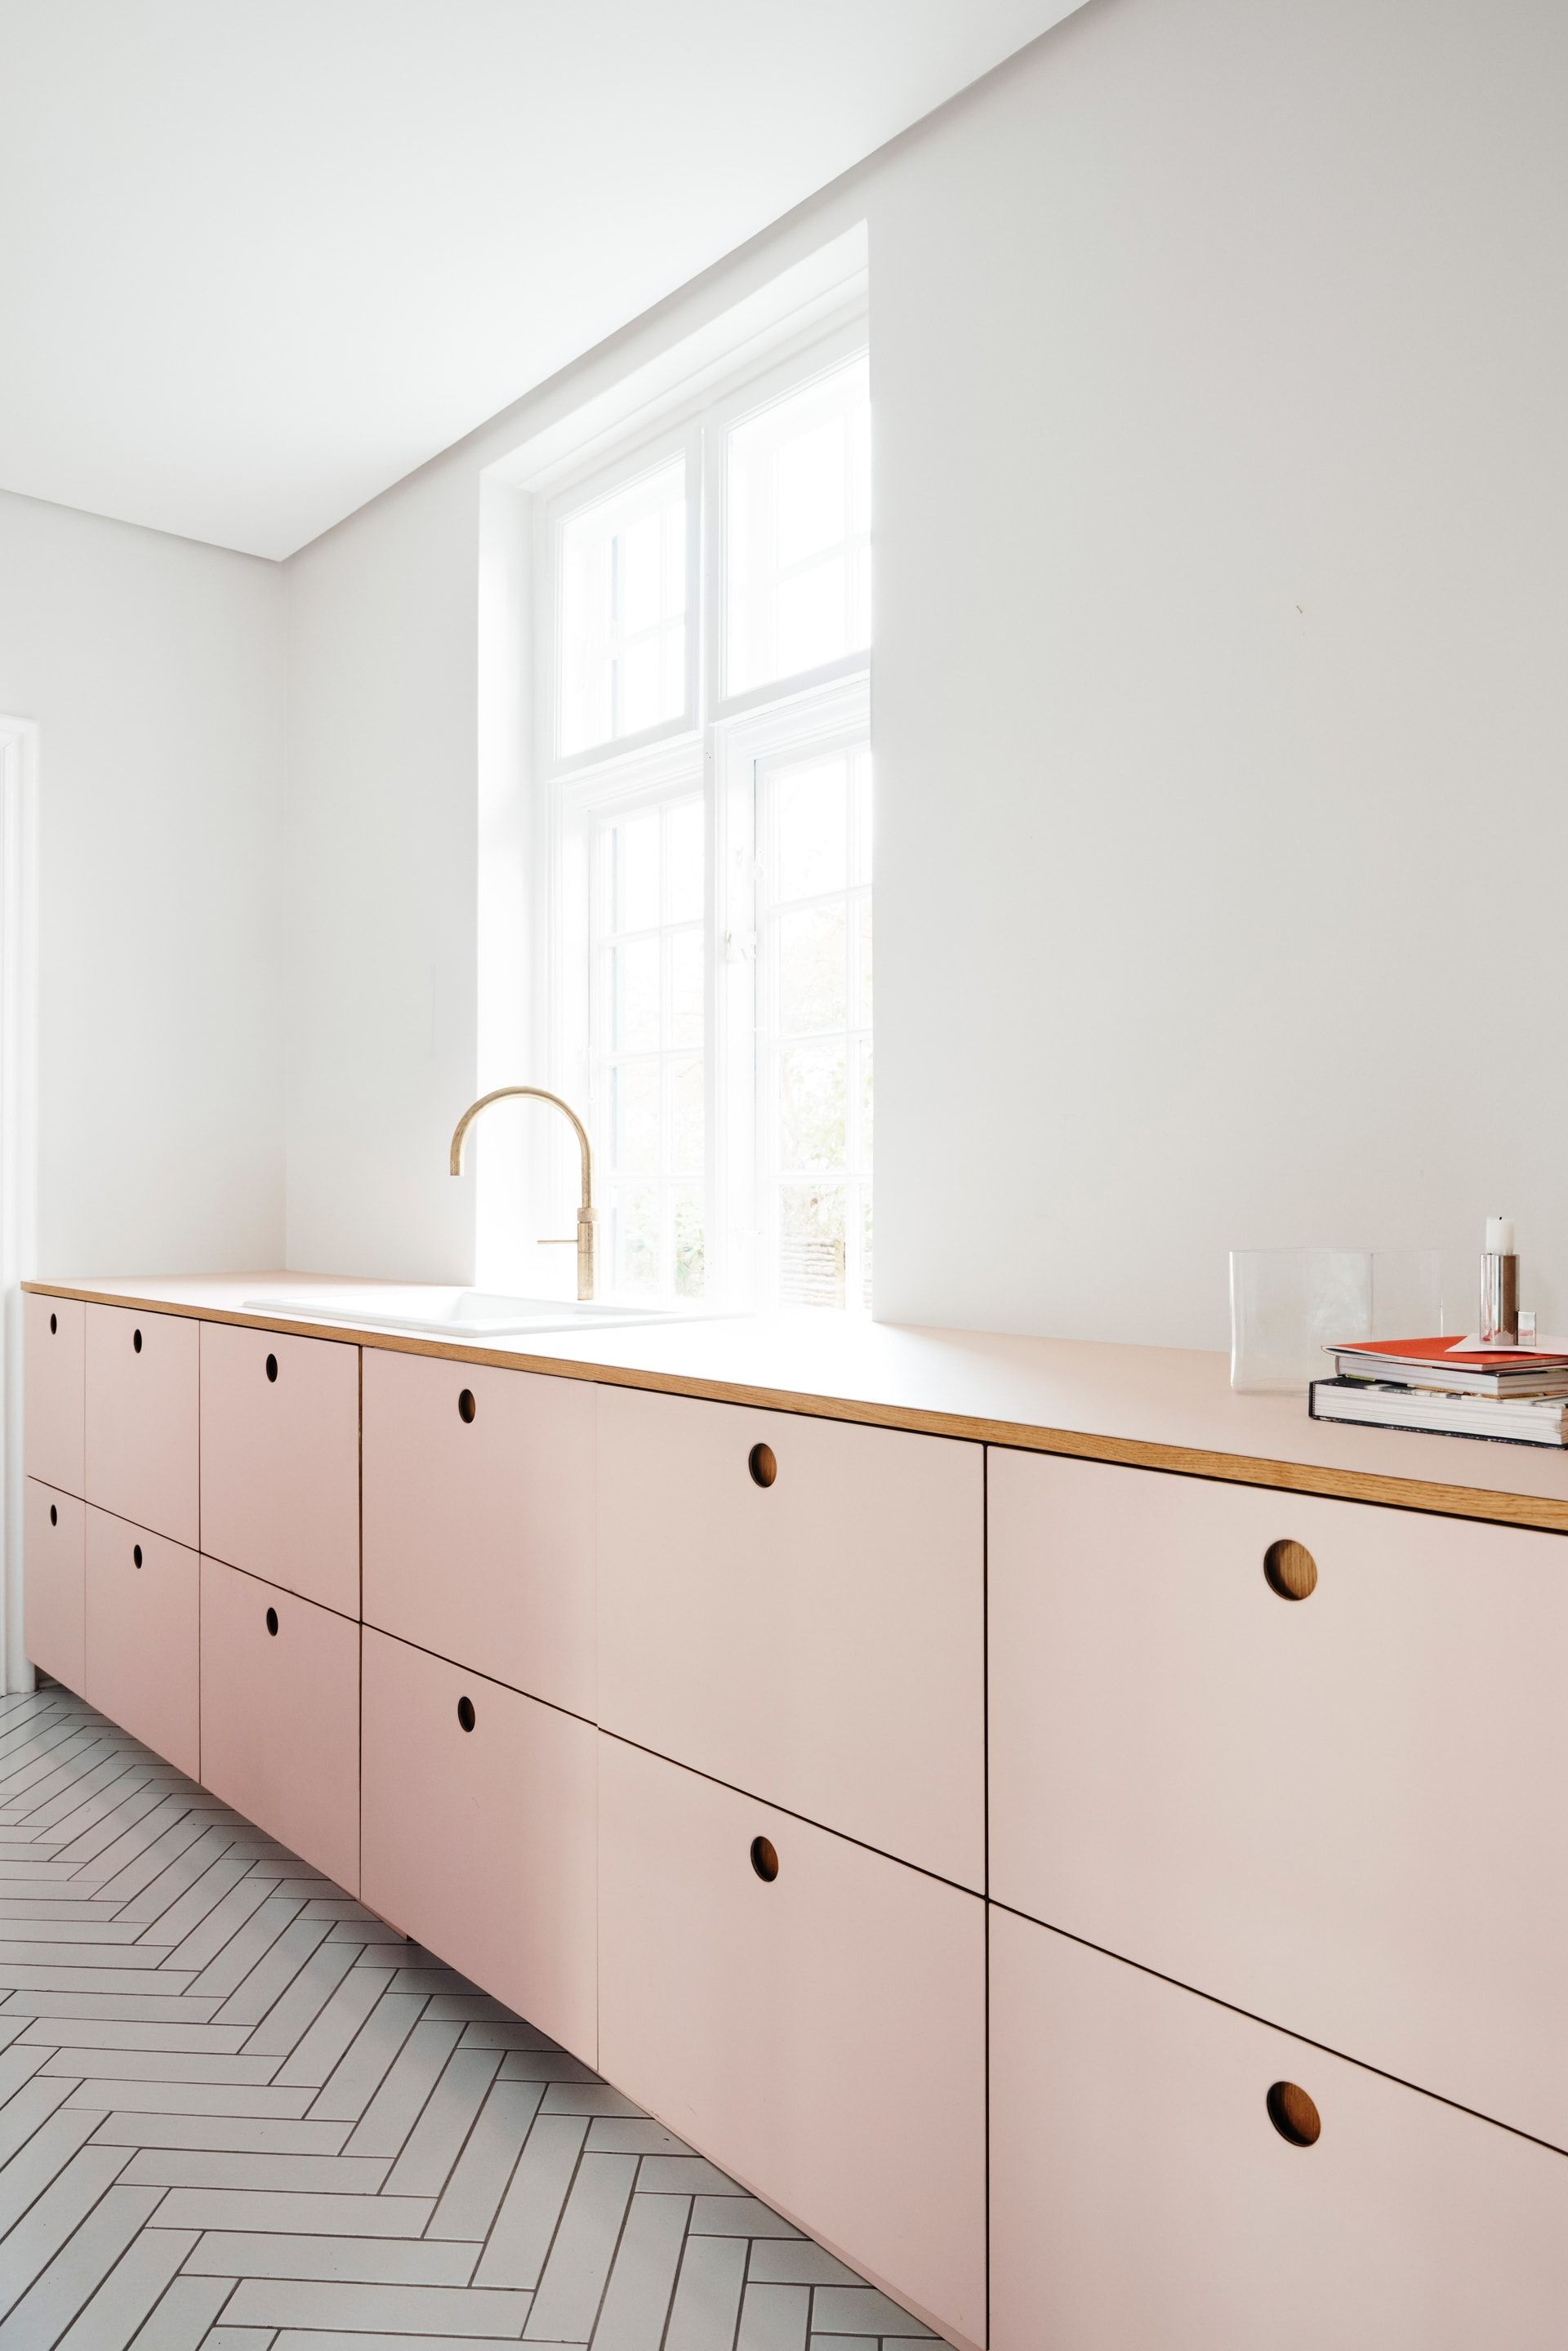 Inspiration North Zealand, Denmark Ikea kitchen design